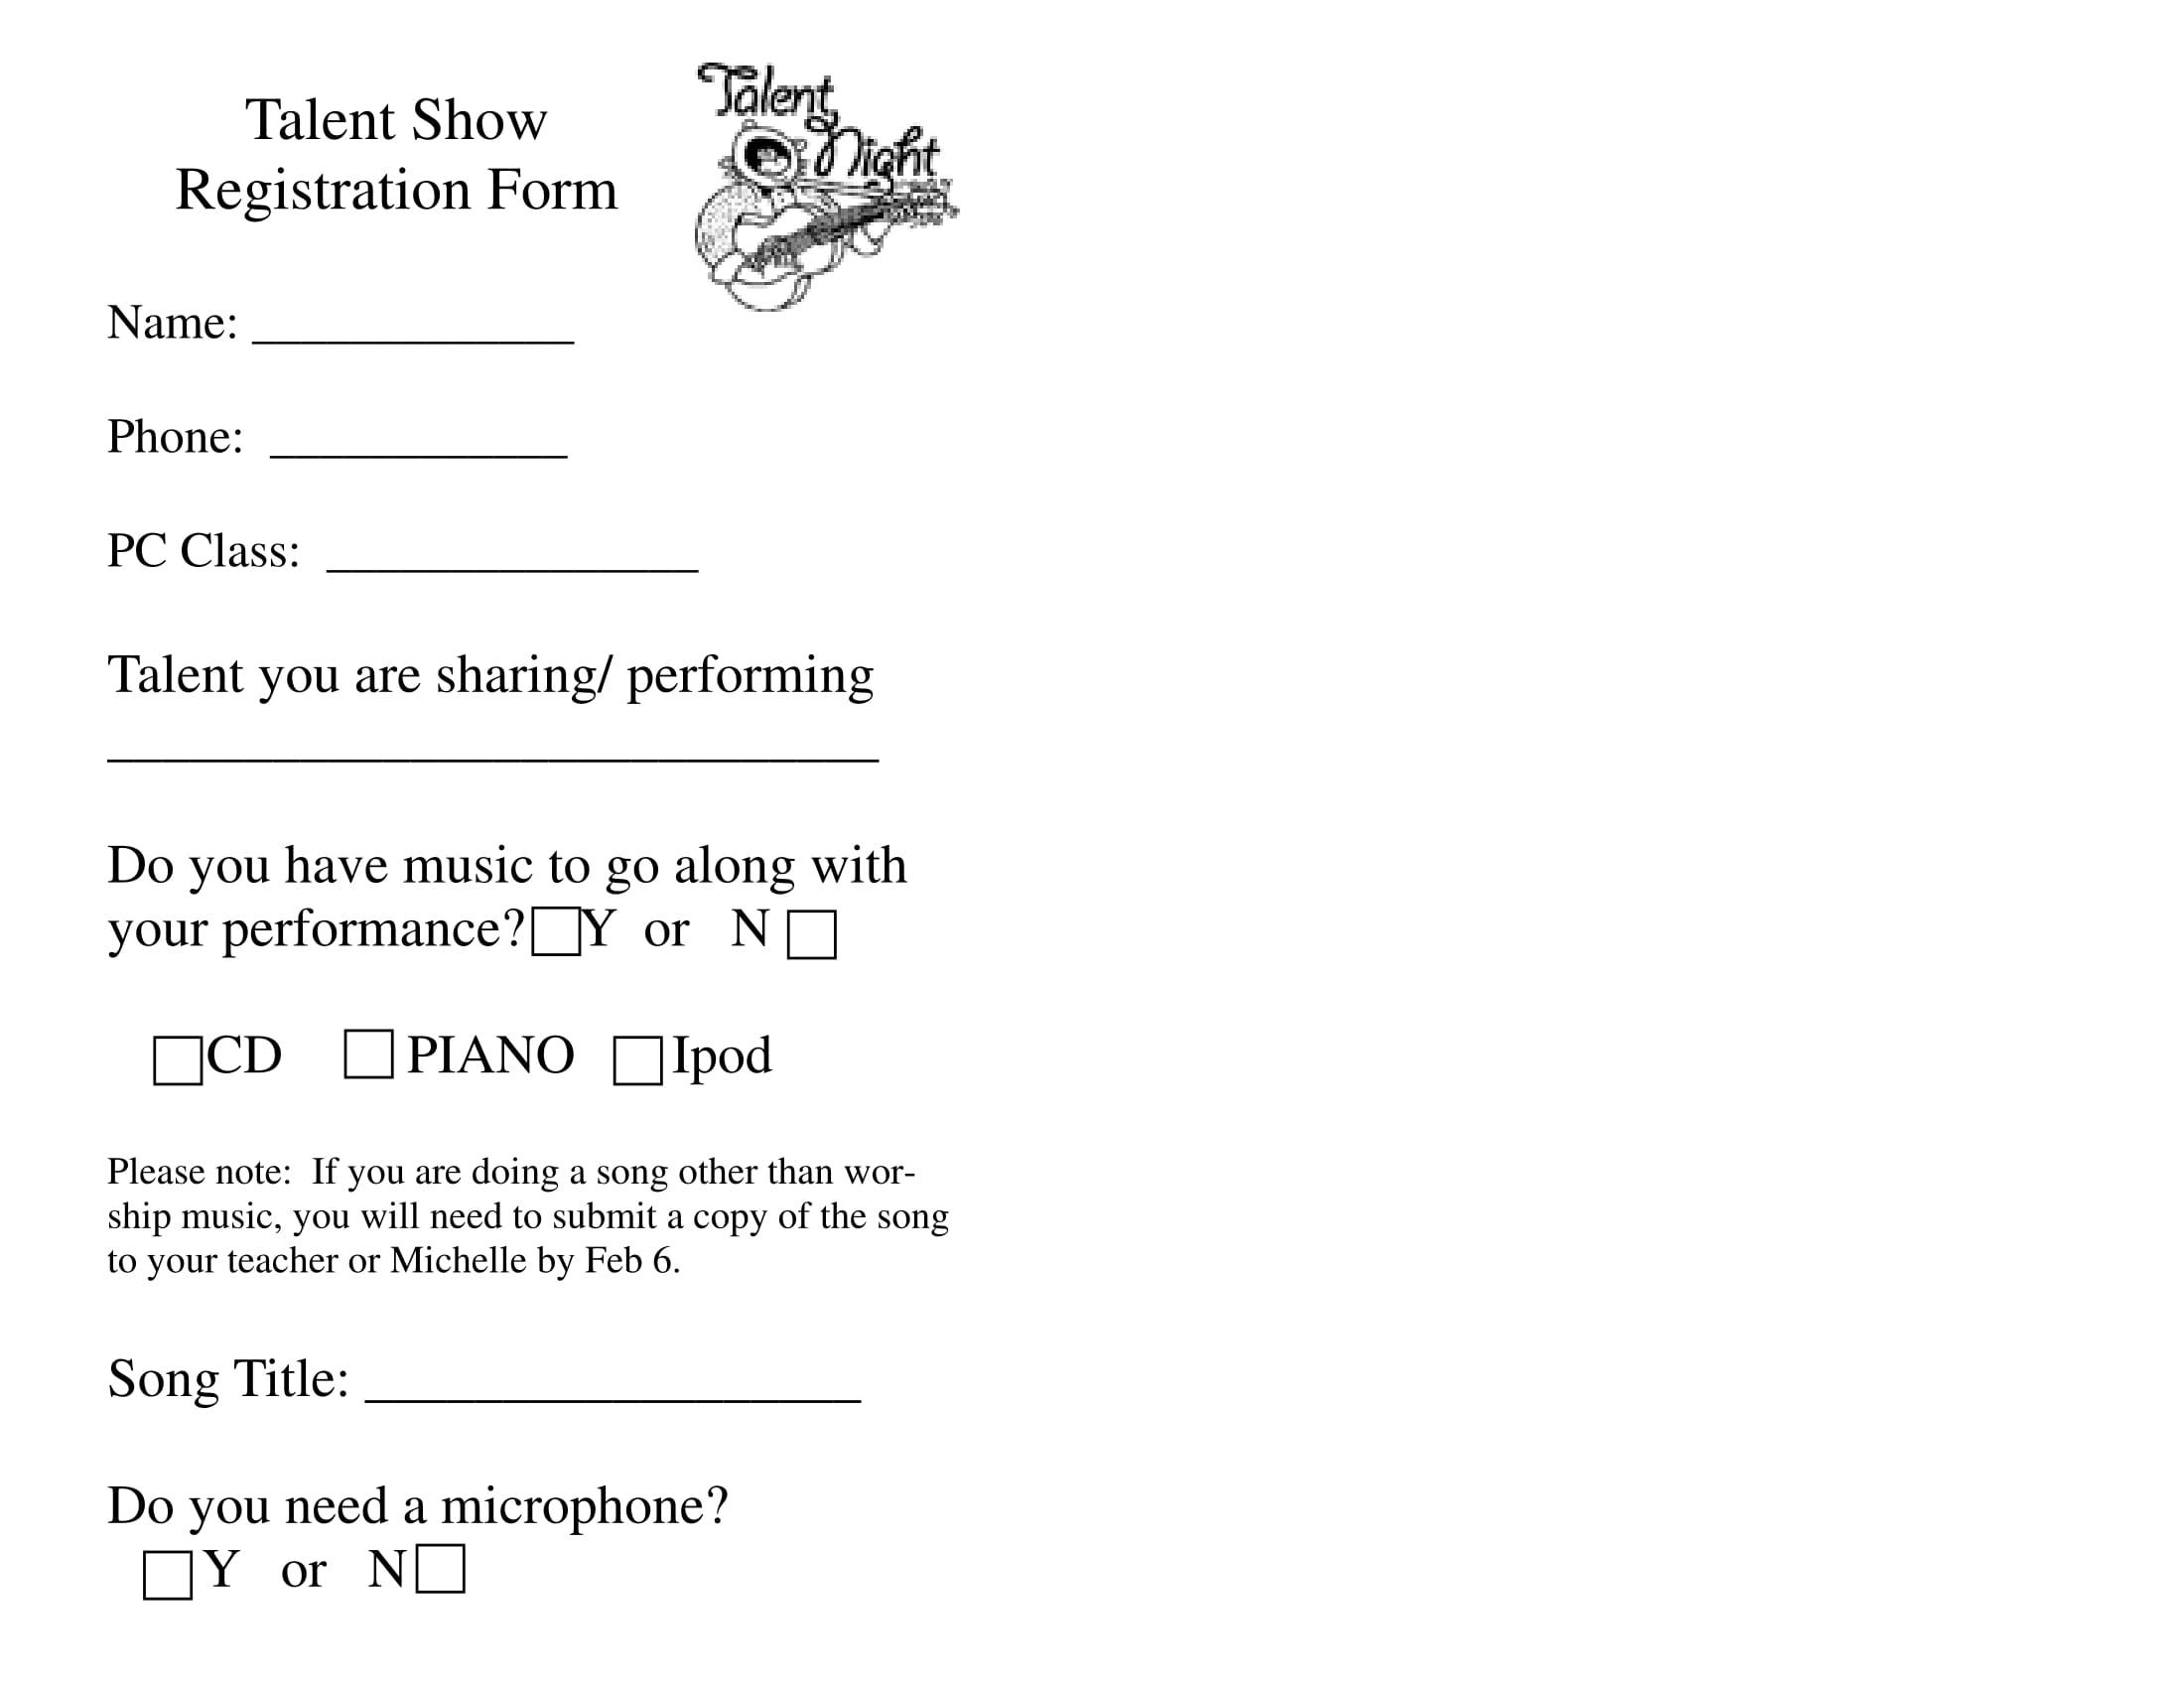 talent show registration form 1